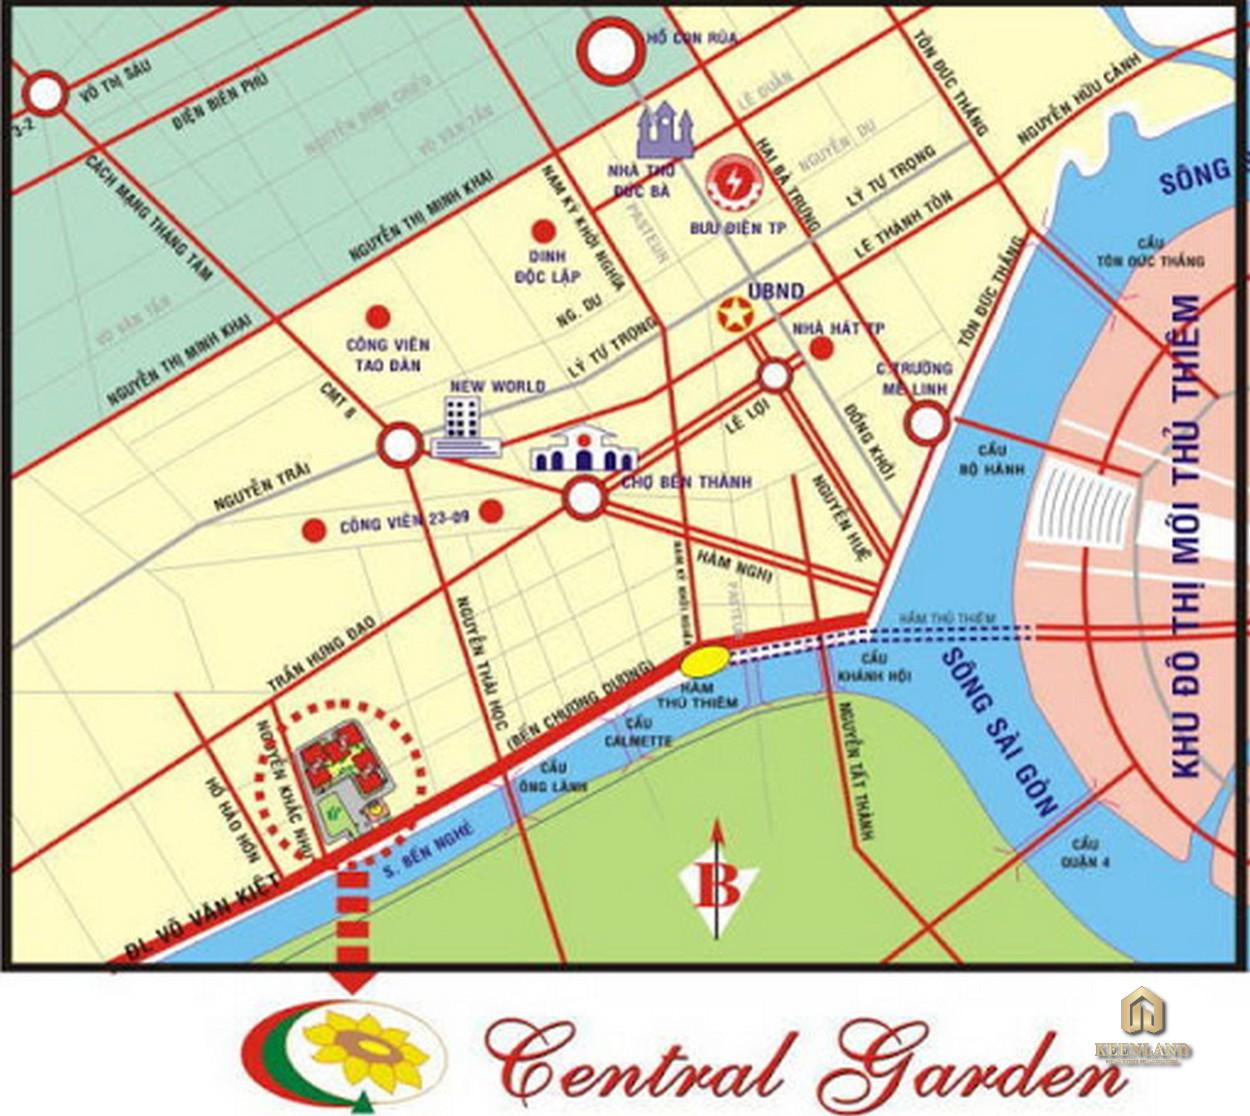 Vị trí dự án Central Garden Quận 1